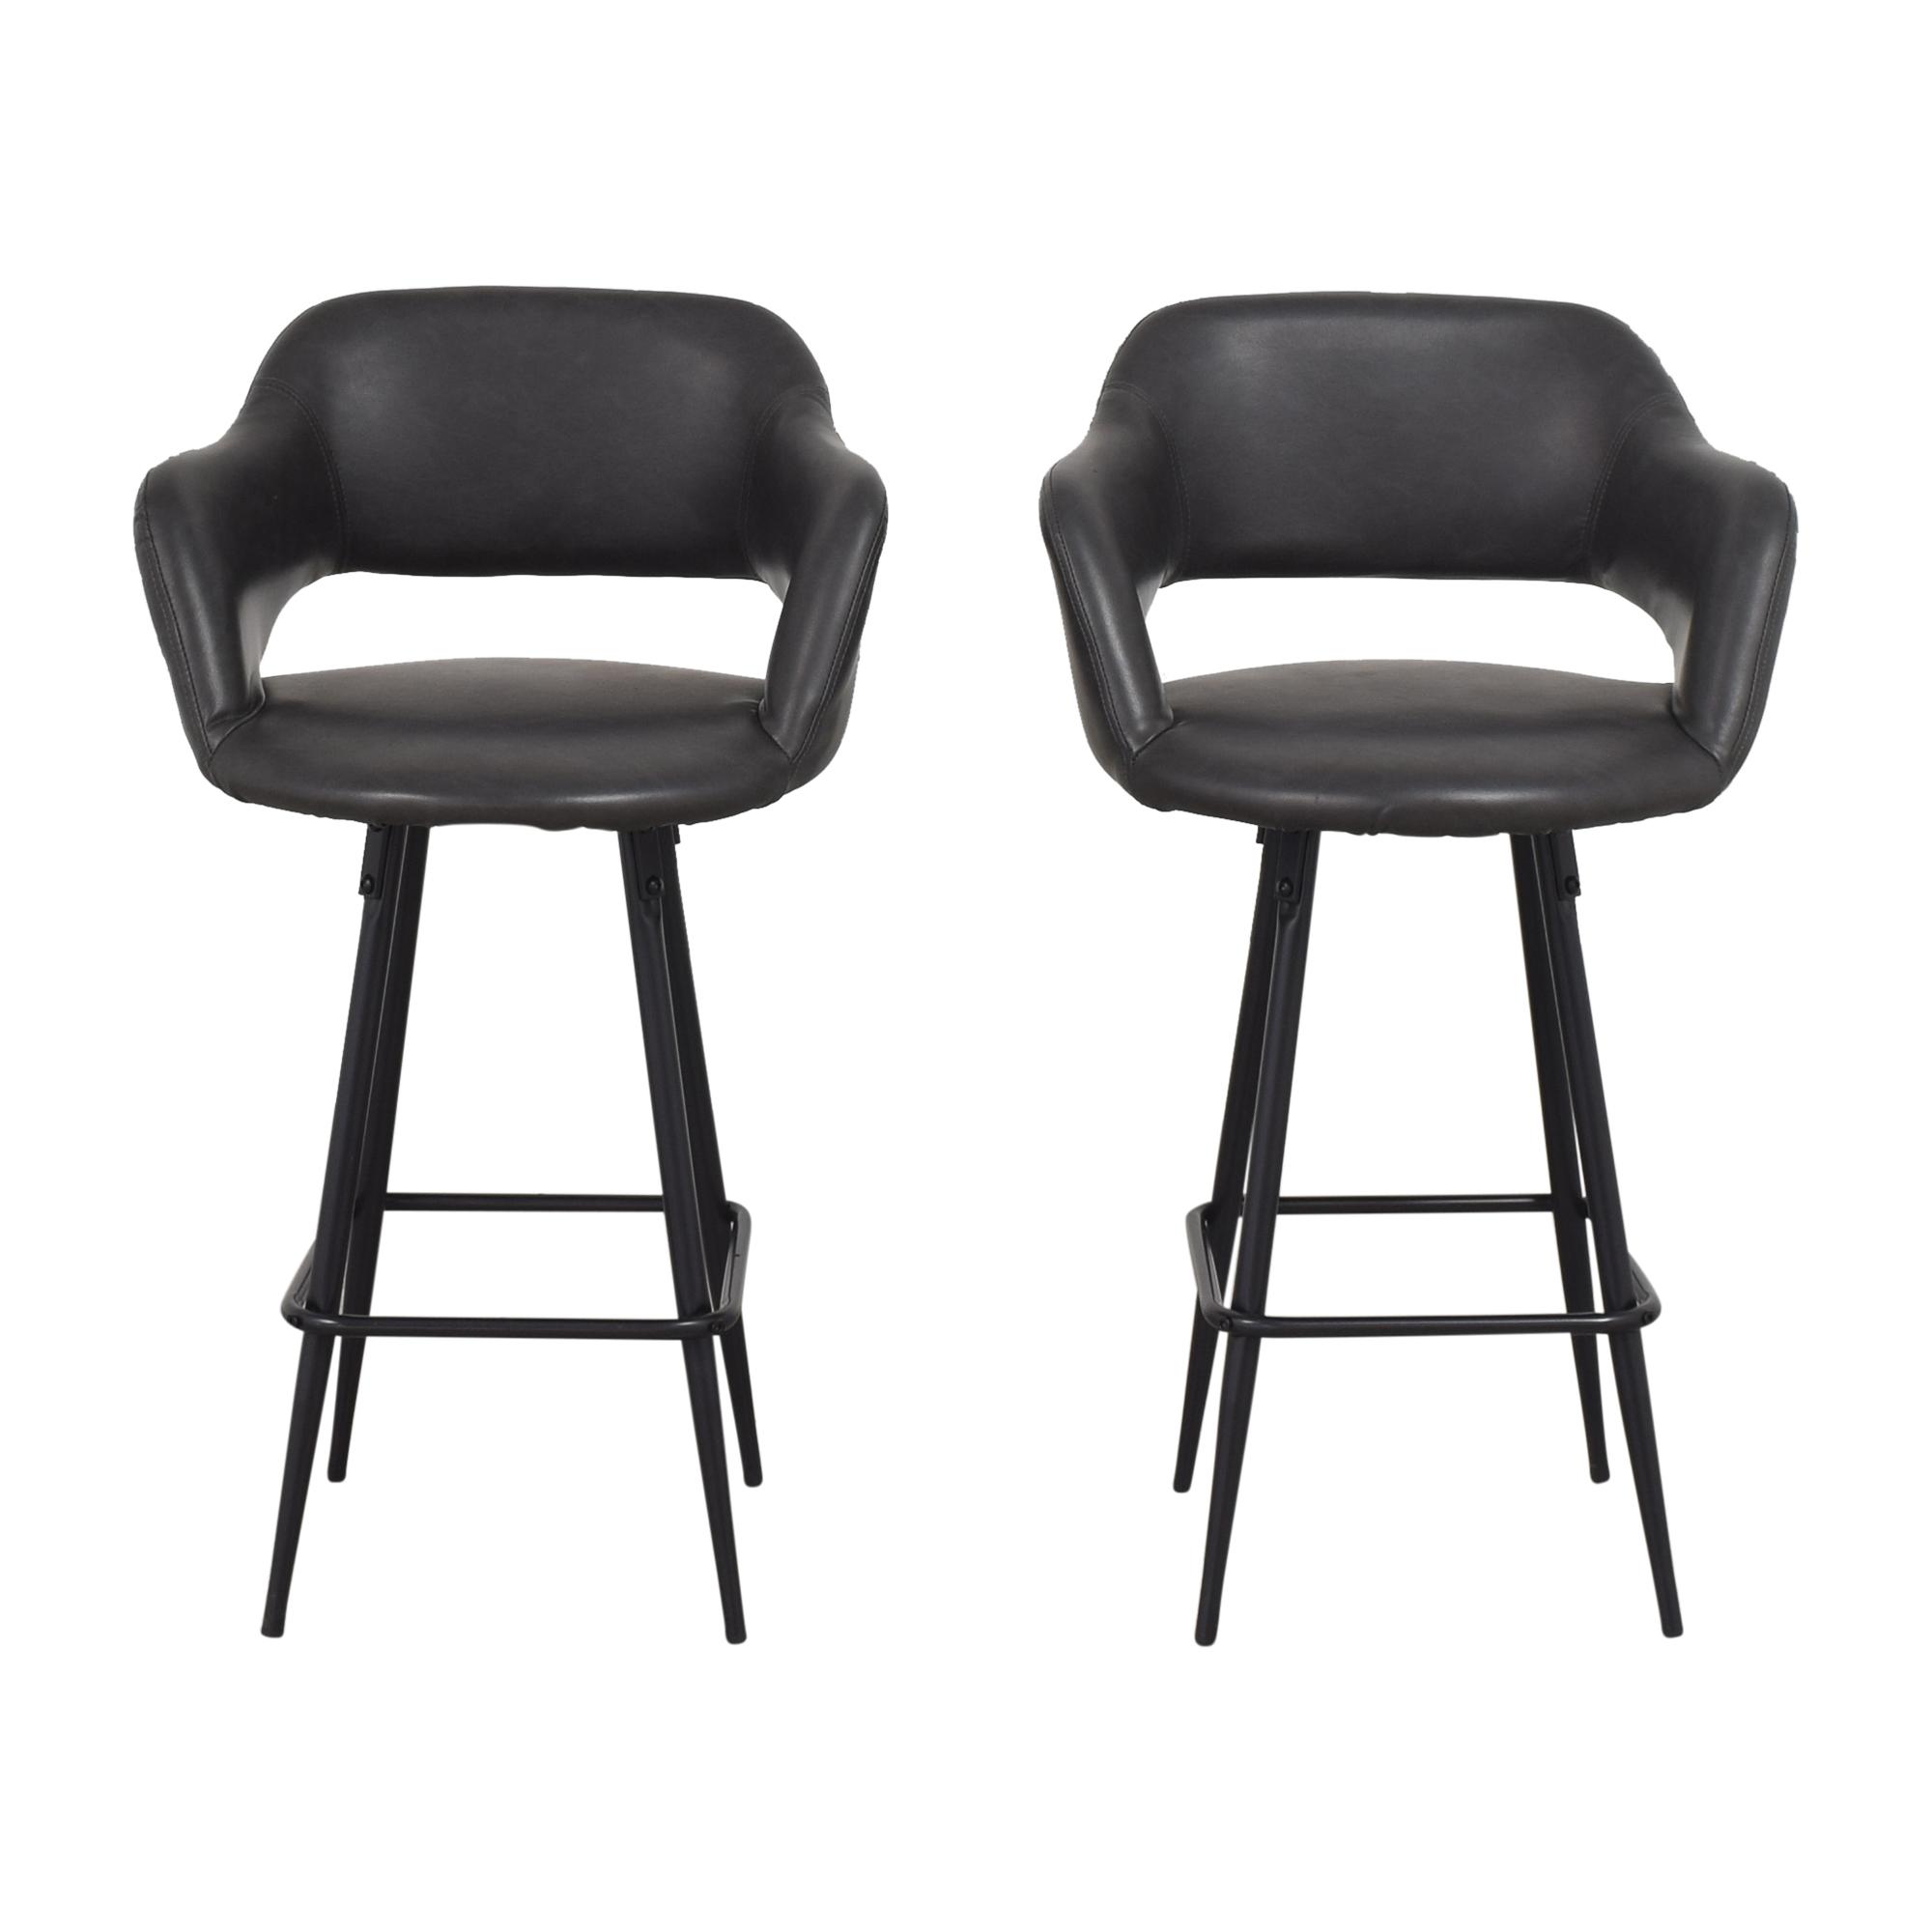 Allmodern Raphael Upholstered Bar Stools / Stools